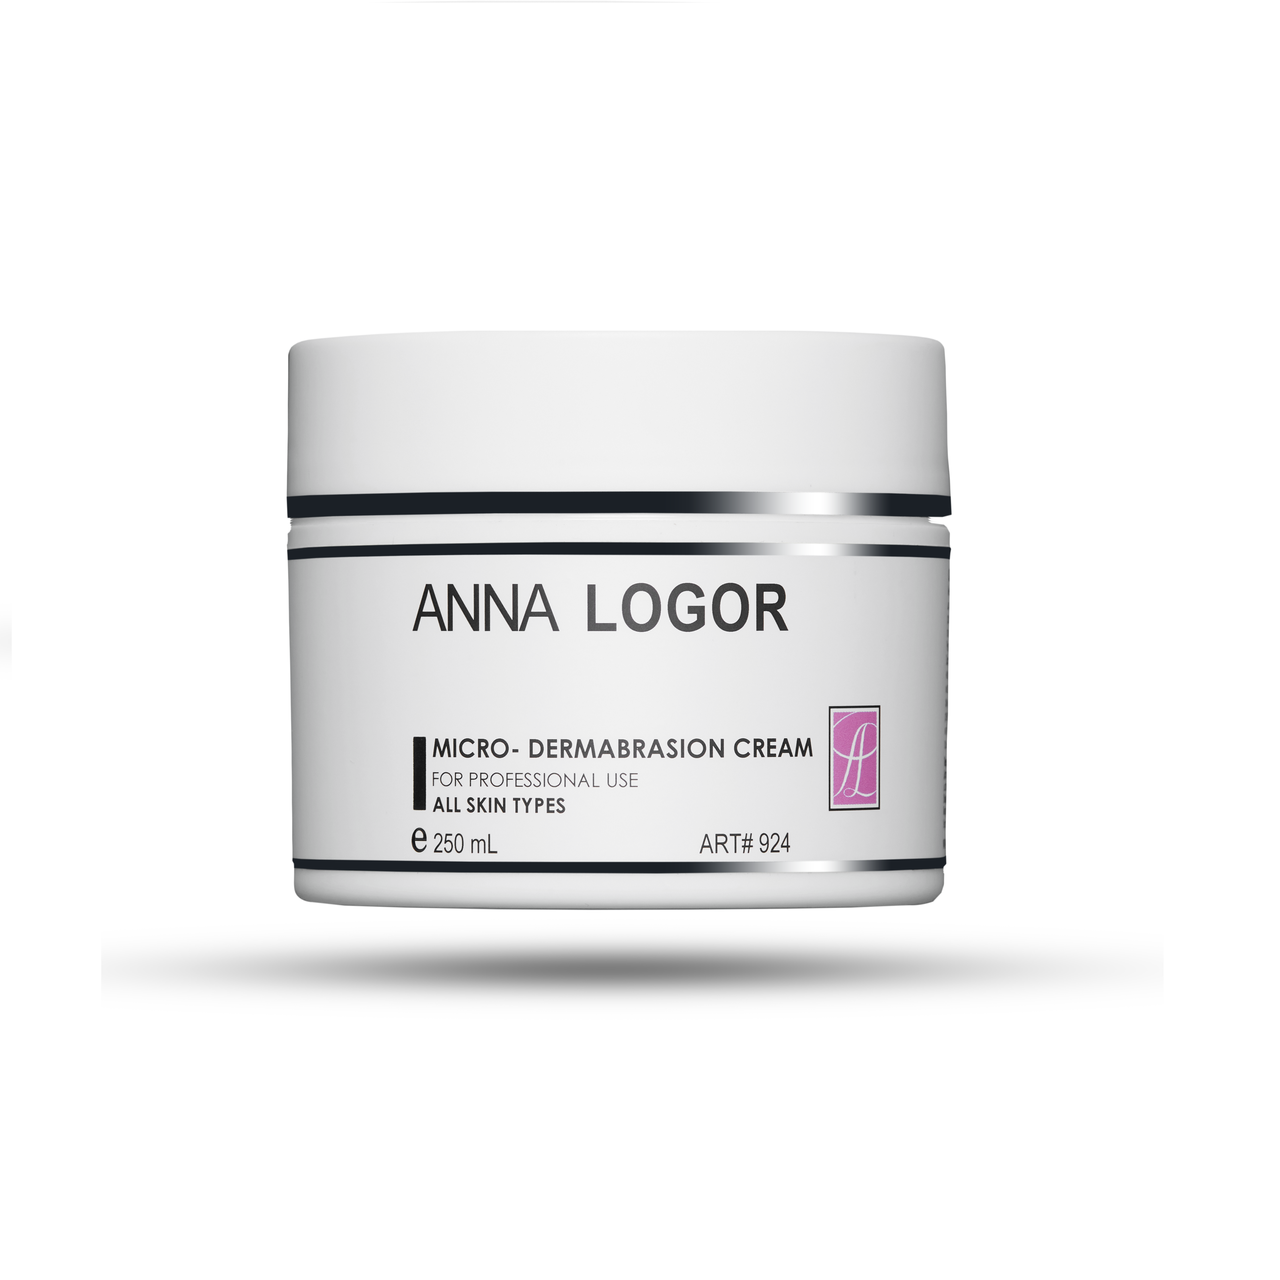 Крем-скраб очищающий Anna LOGOR Micro-dermabrasion Cream 250 ml Art.924